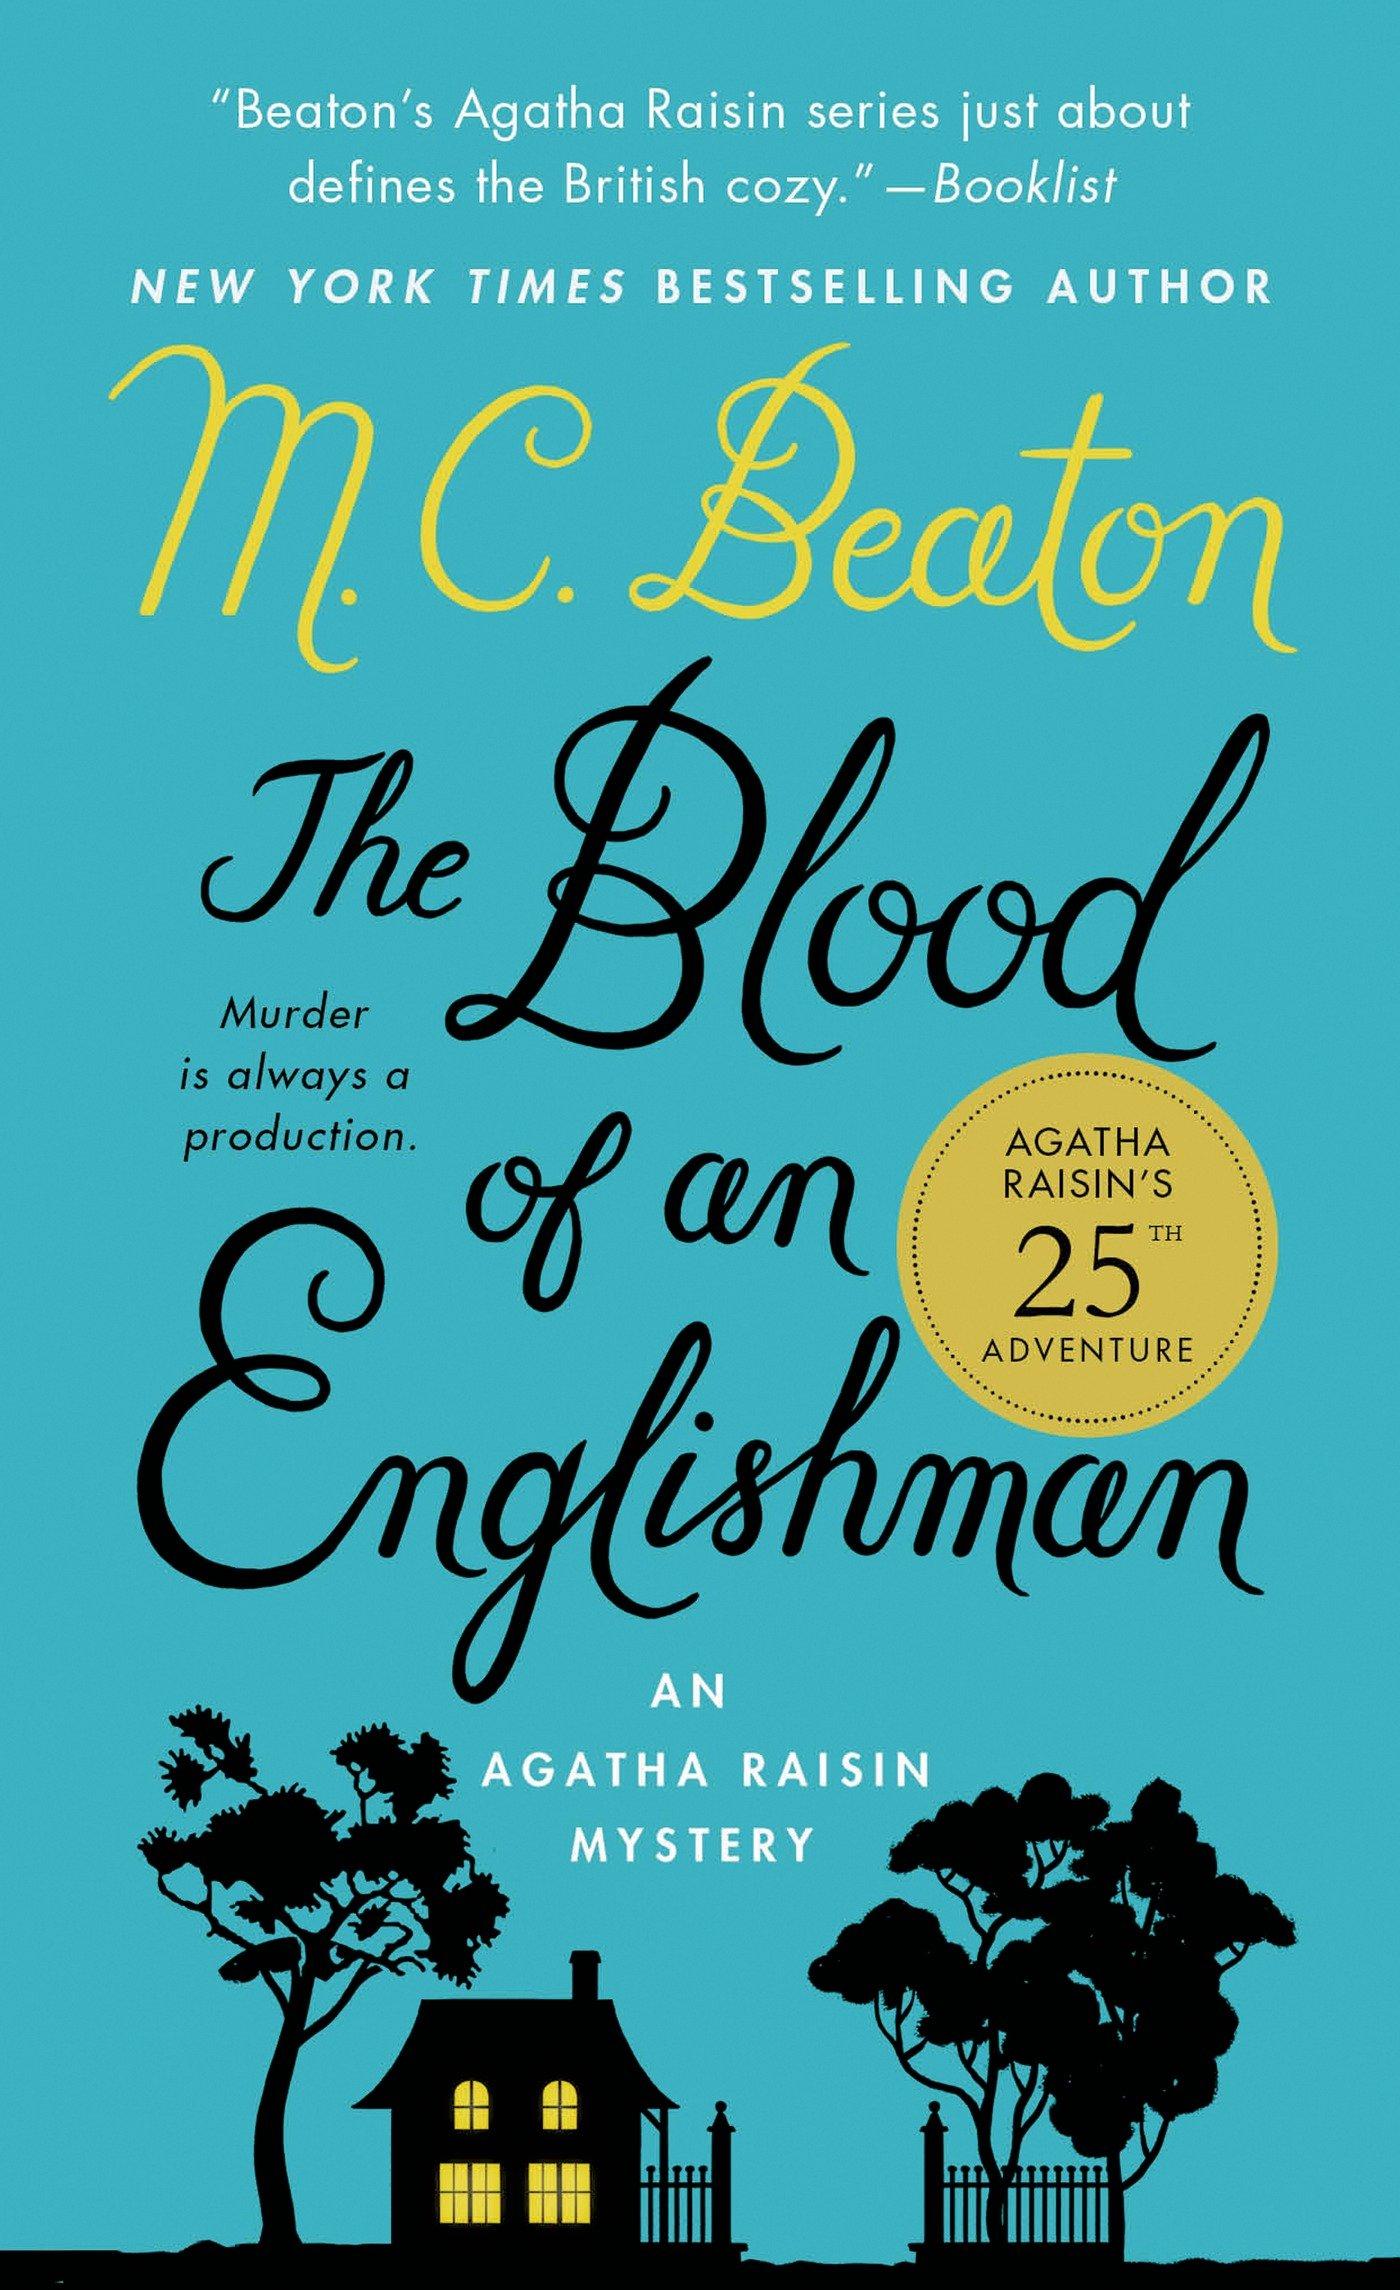 The Blood of an Englishman: An Agatha Raisin Mystery (Agatha Raisin ...